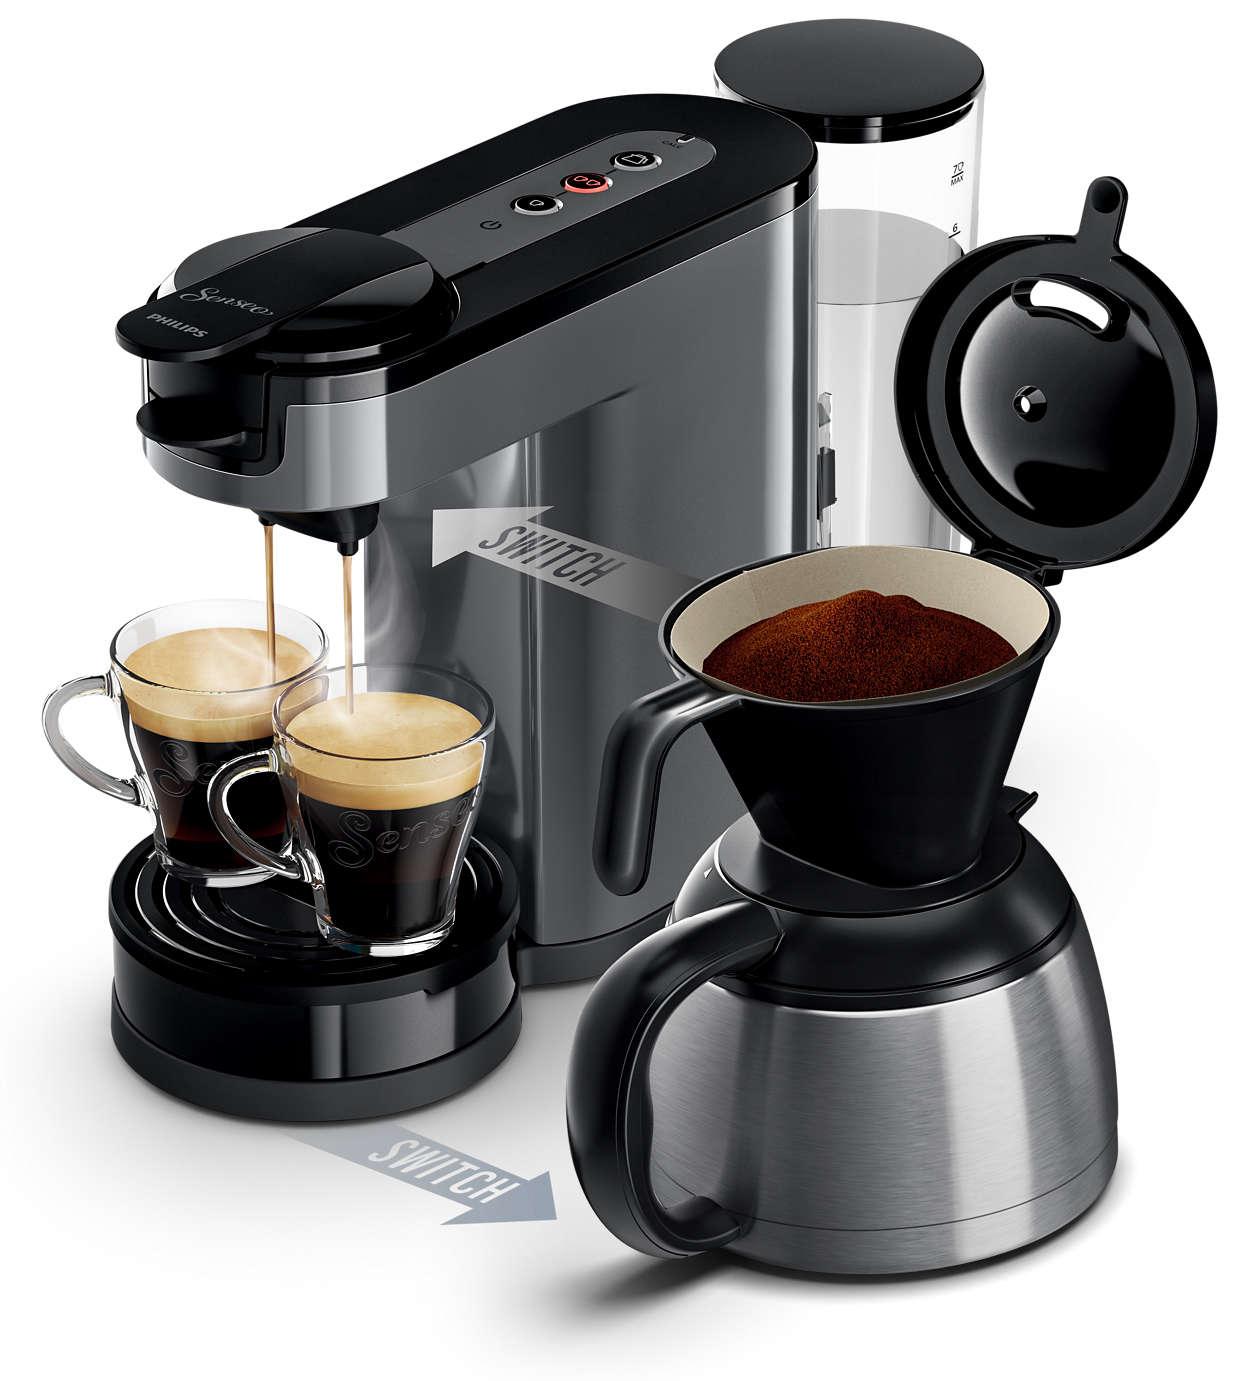 Filtre Pour Machine A Cafe Senseo